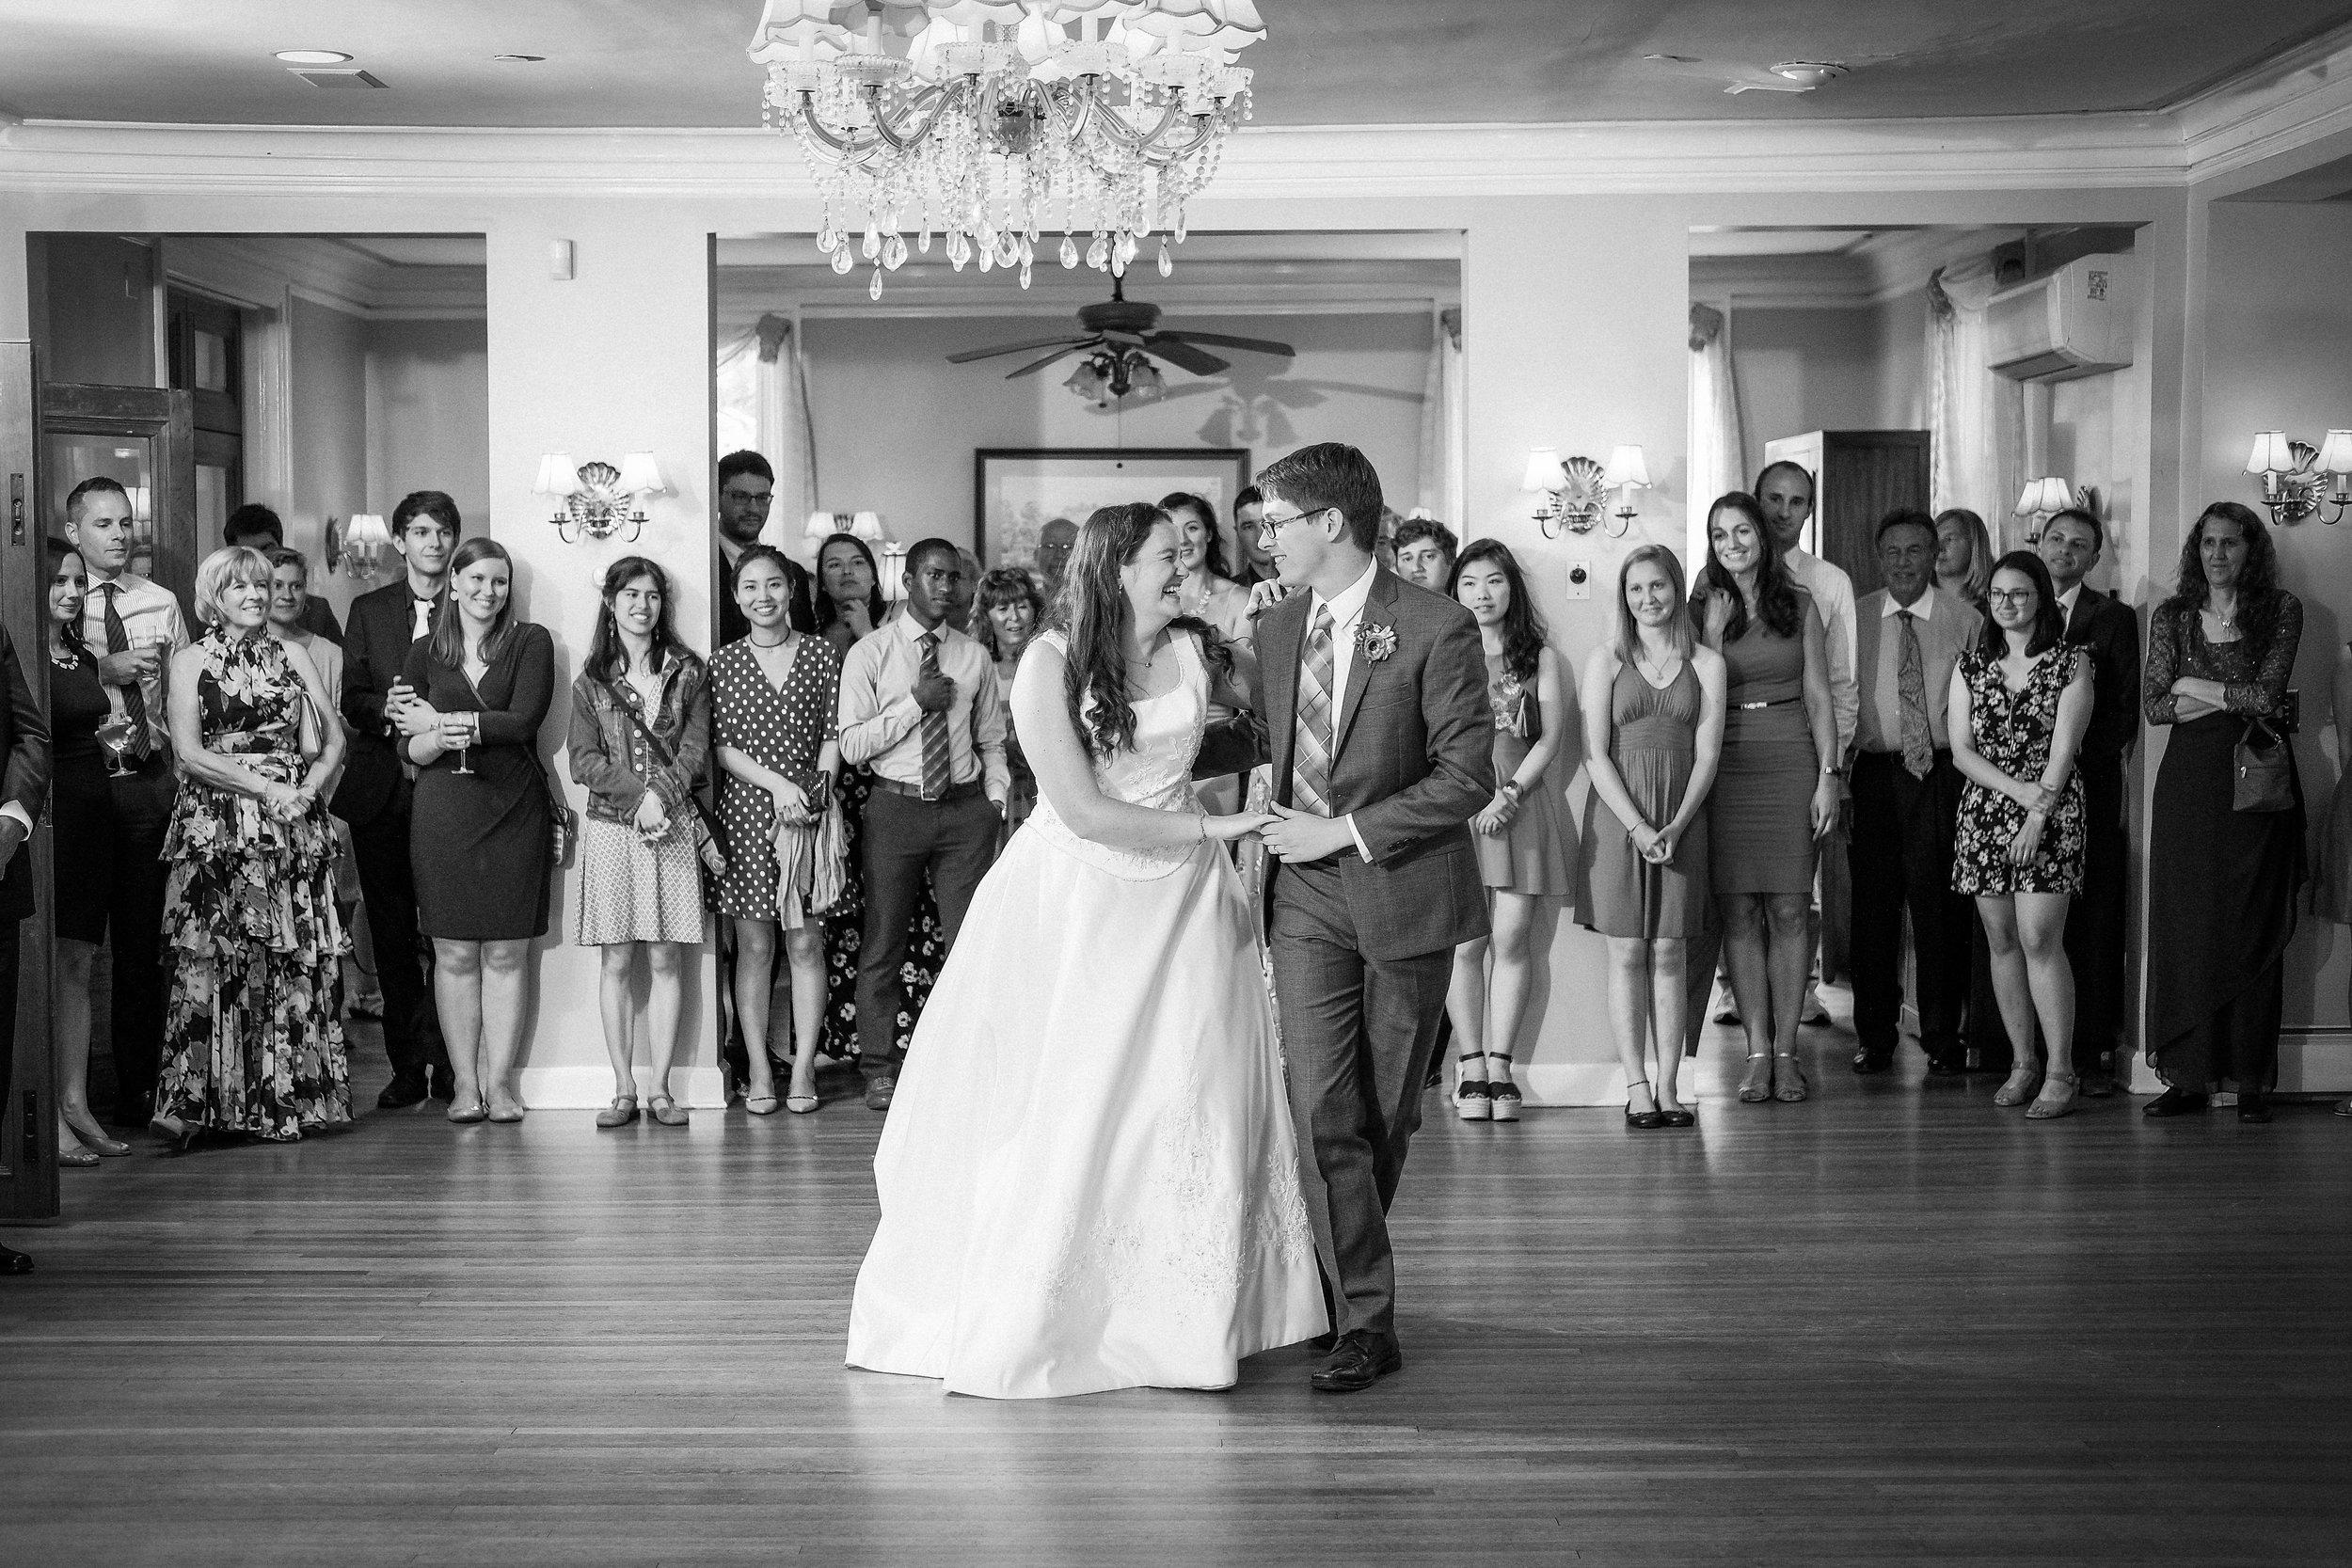 Vermont-Lilac-Inn-Wedding-Photography-1030.jpg